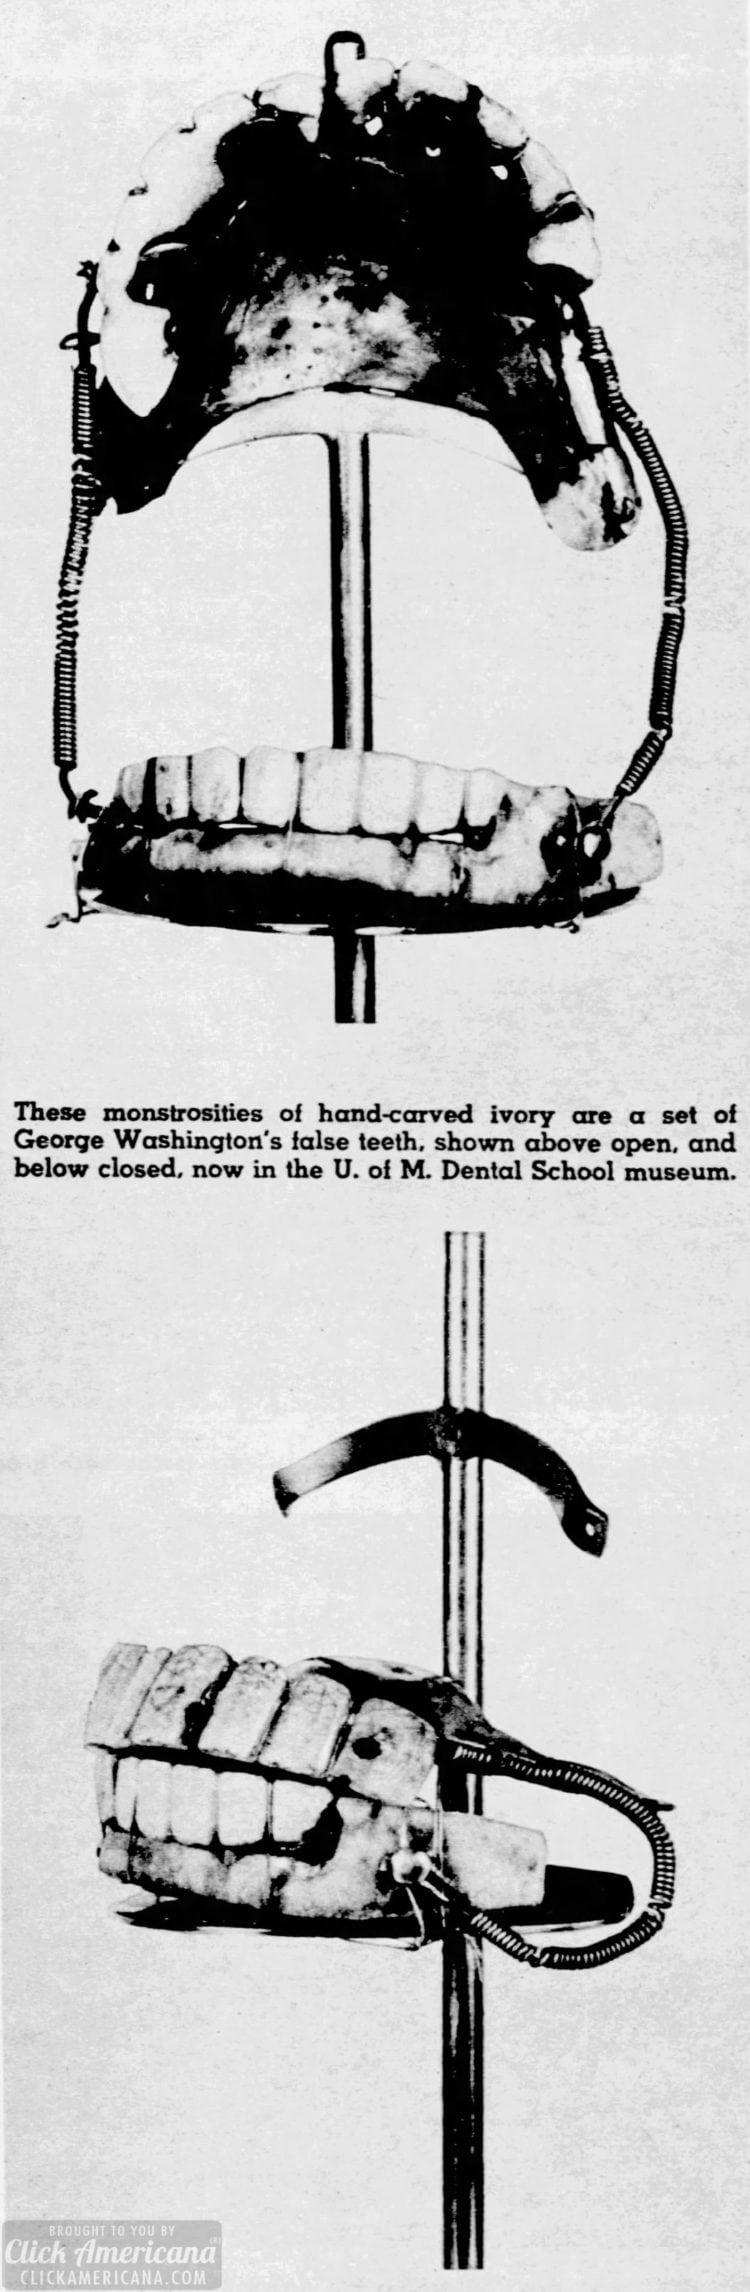 George Washington's false teeth in 1954